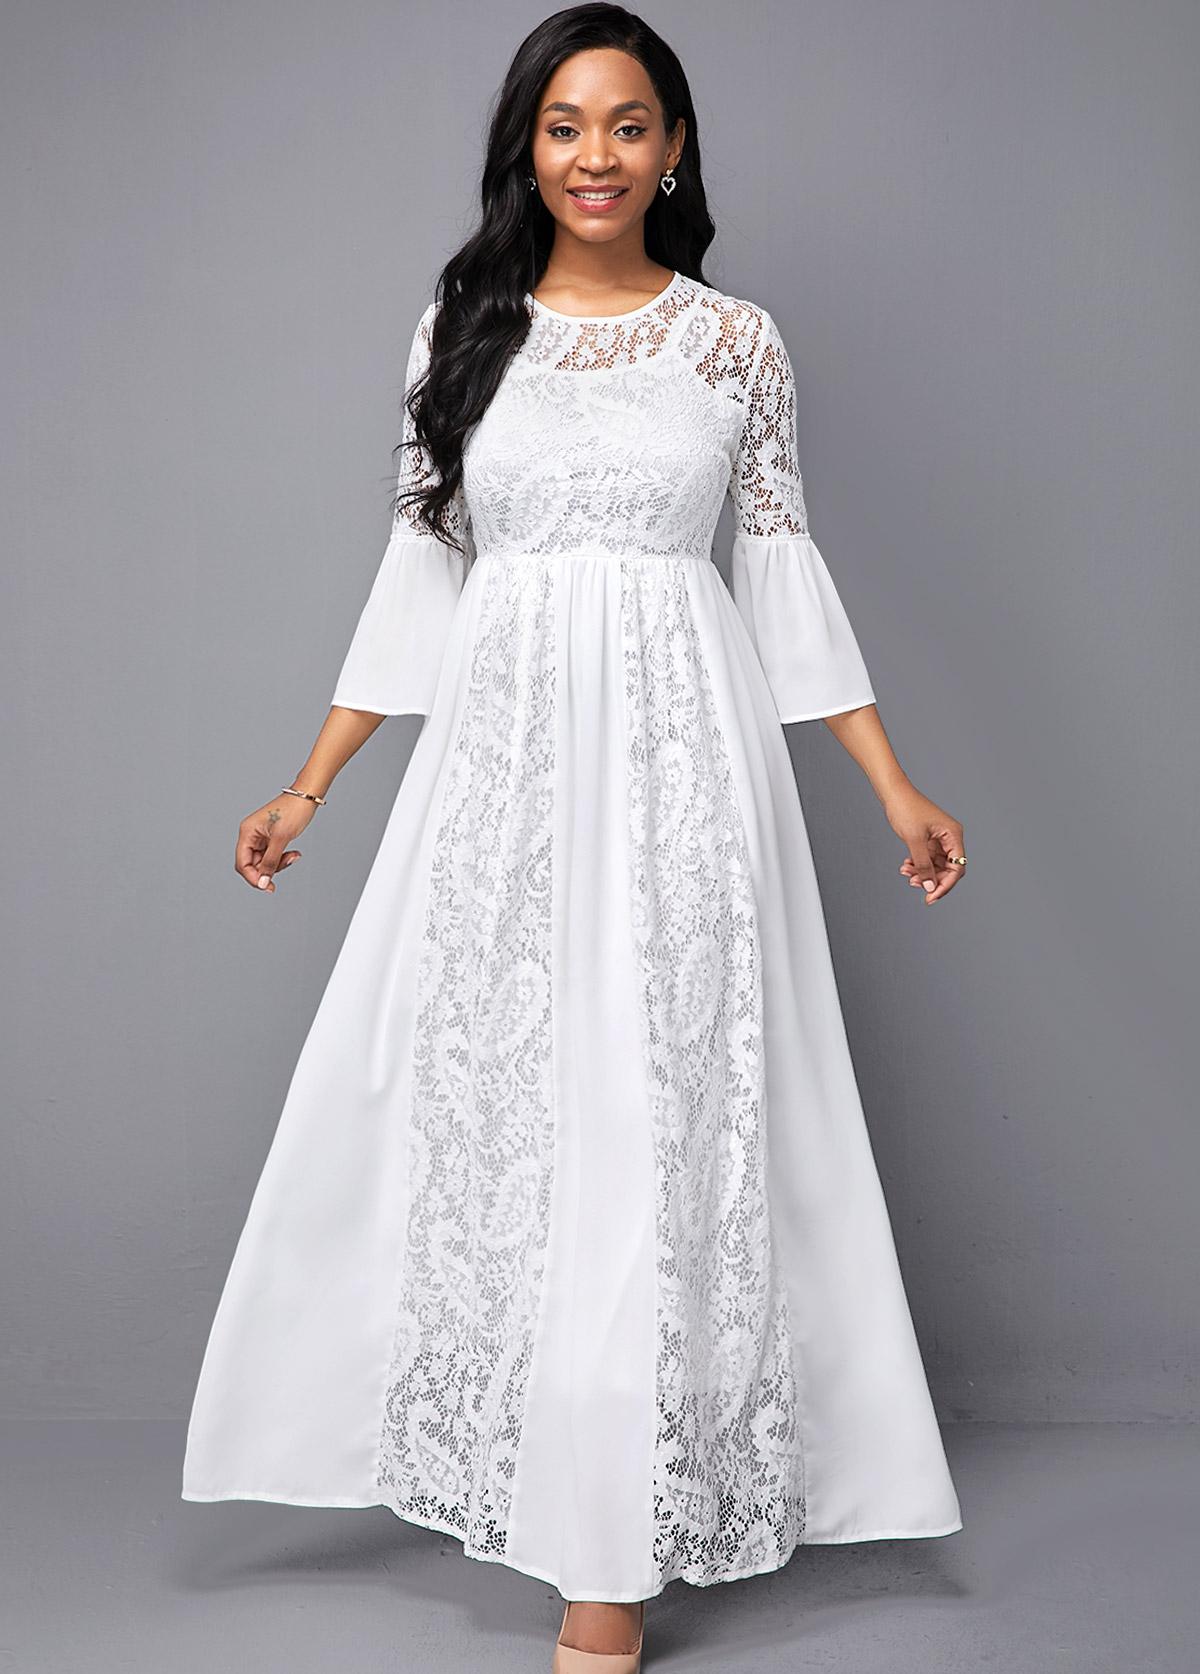 ROTITA Lace Patchwork Round Neck High Waist Dress